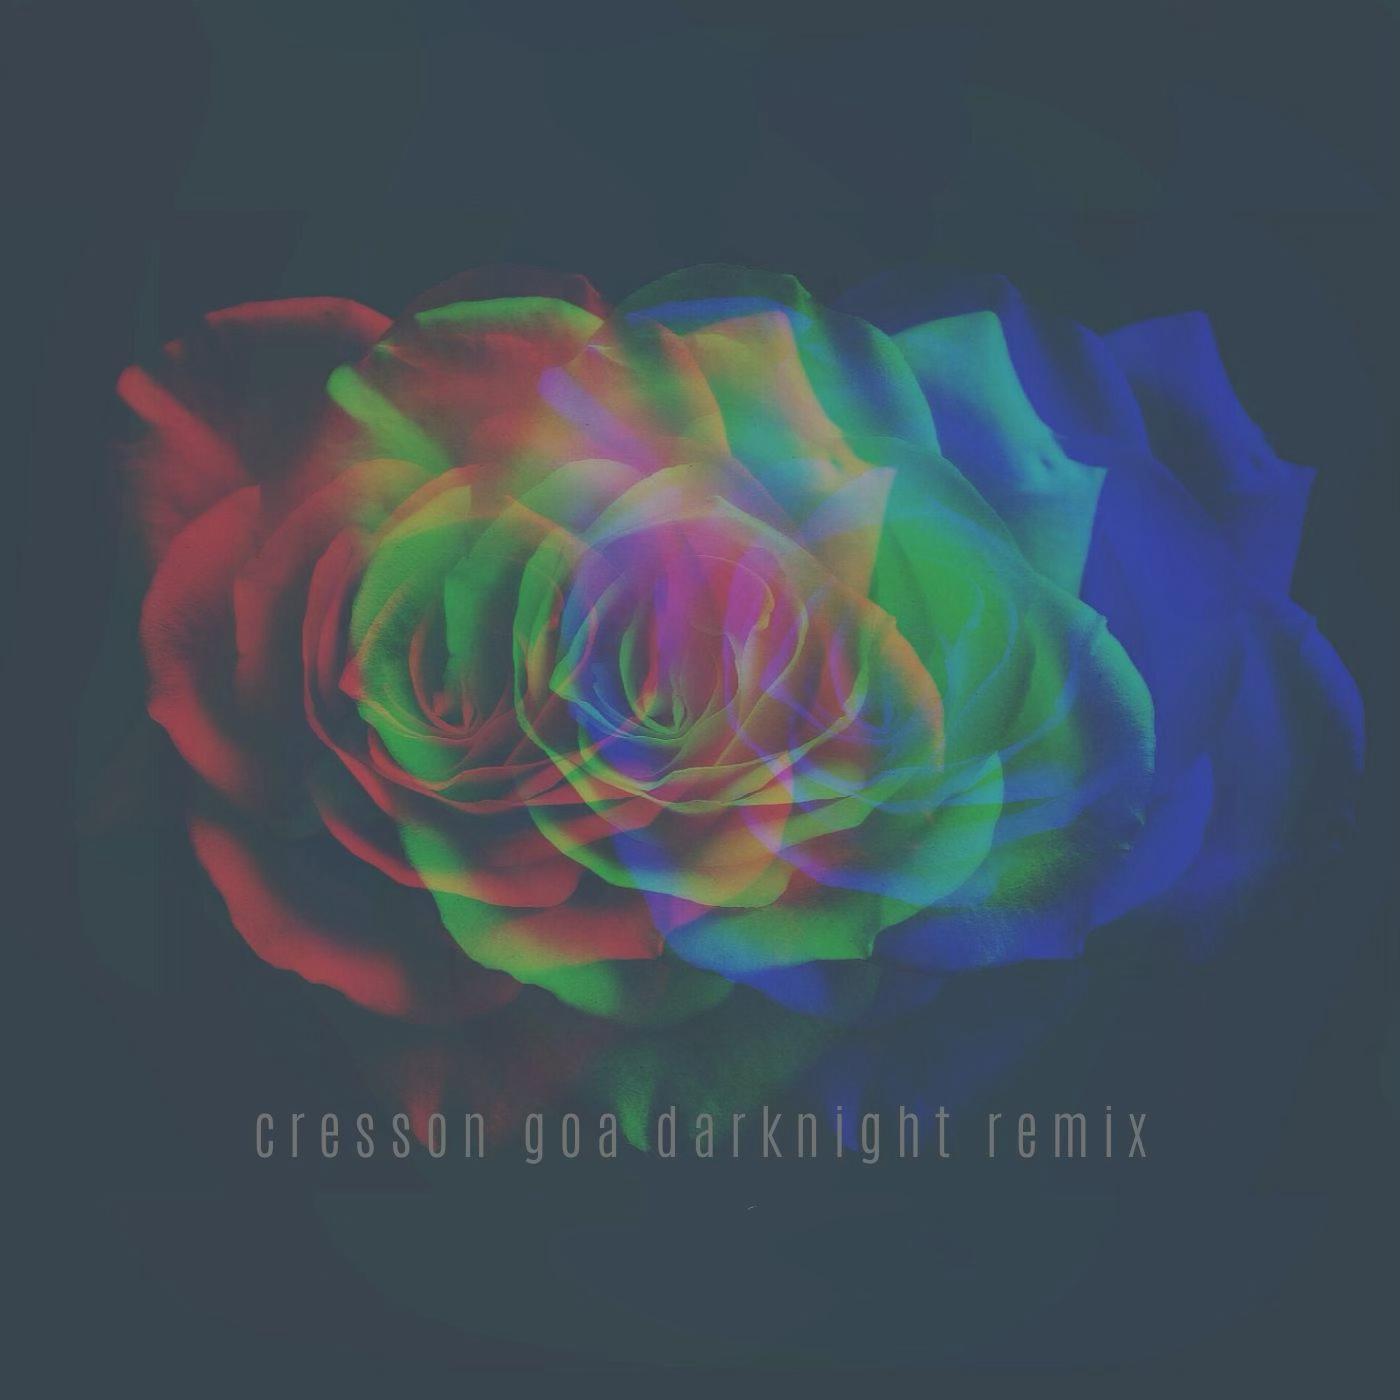 Cresson goa darknight mix